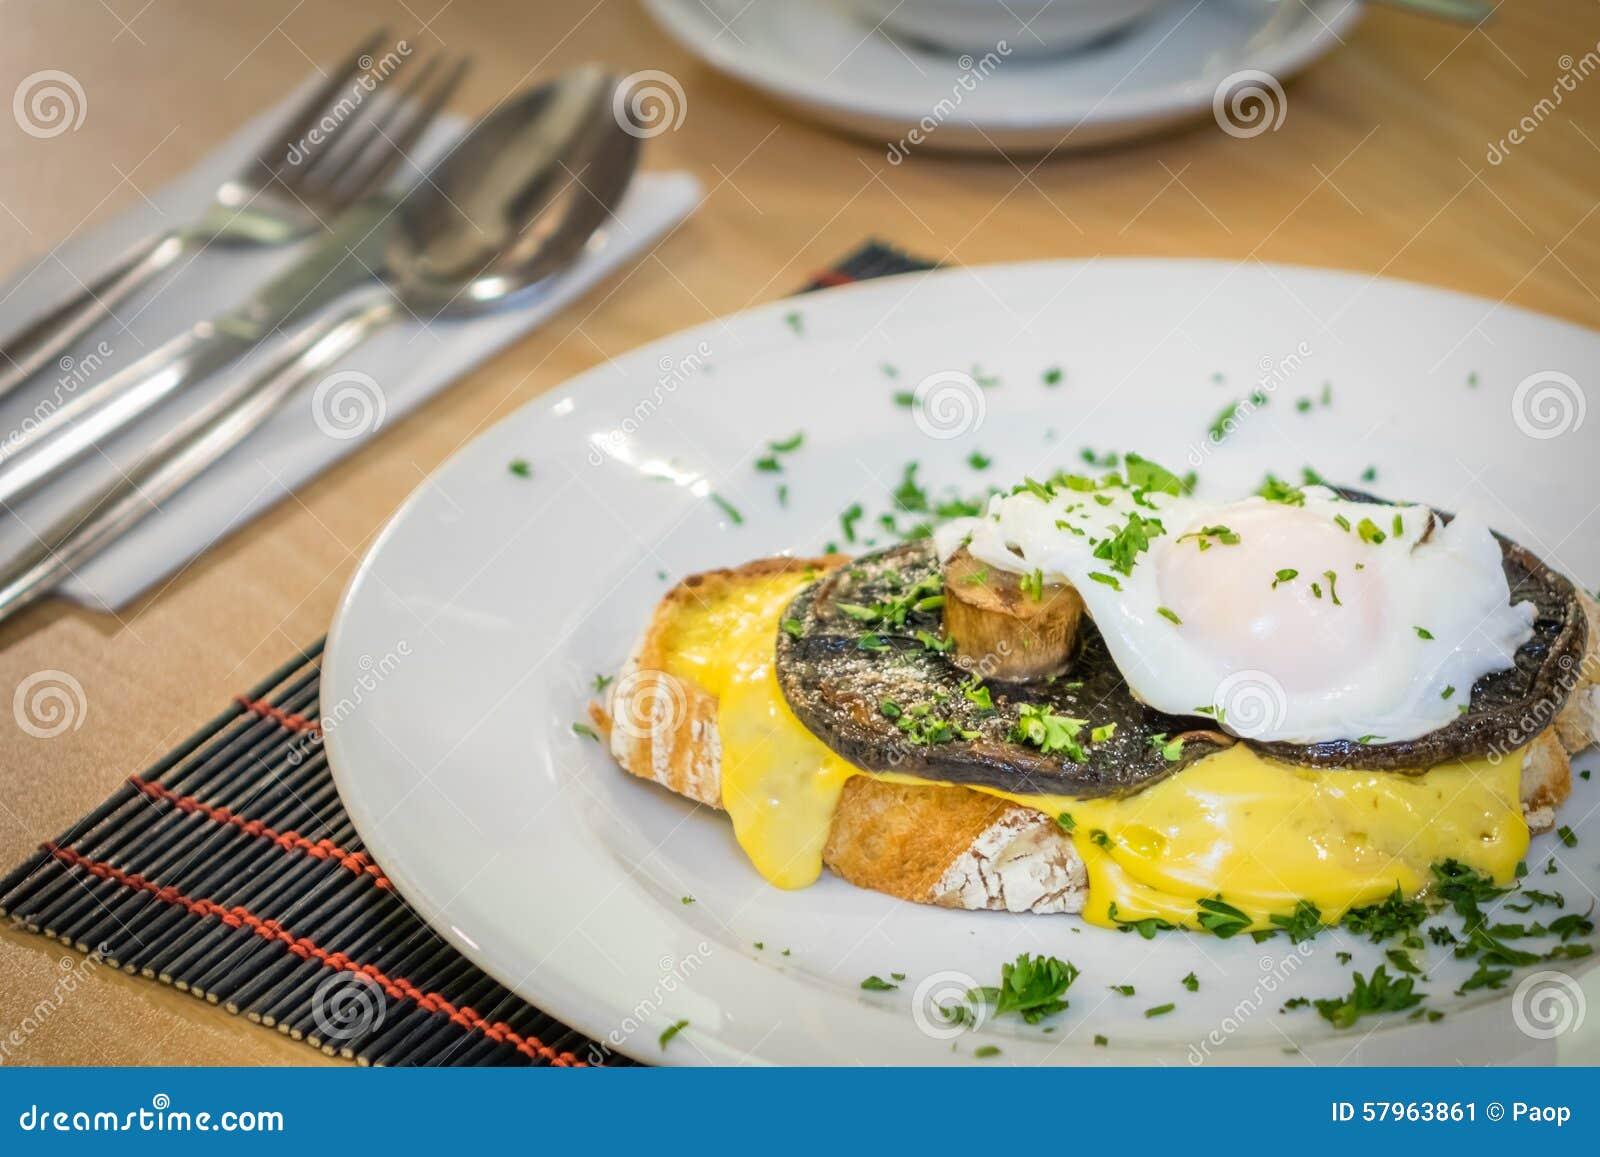 Mushroom Egg Benedict Sandwich Stock Photo - Image: 57963861